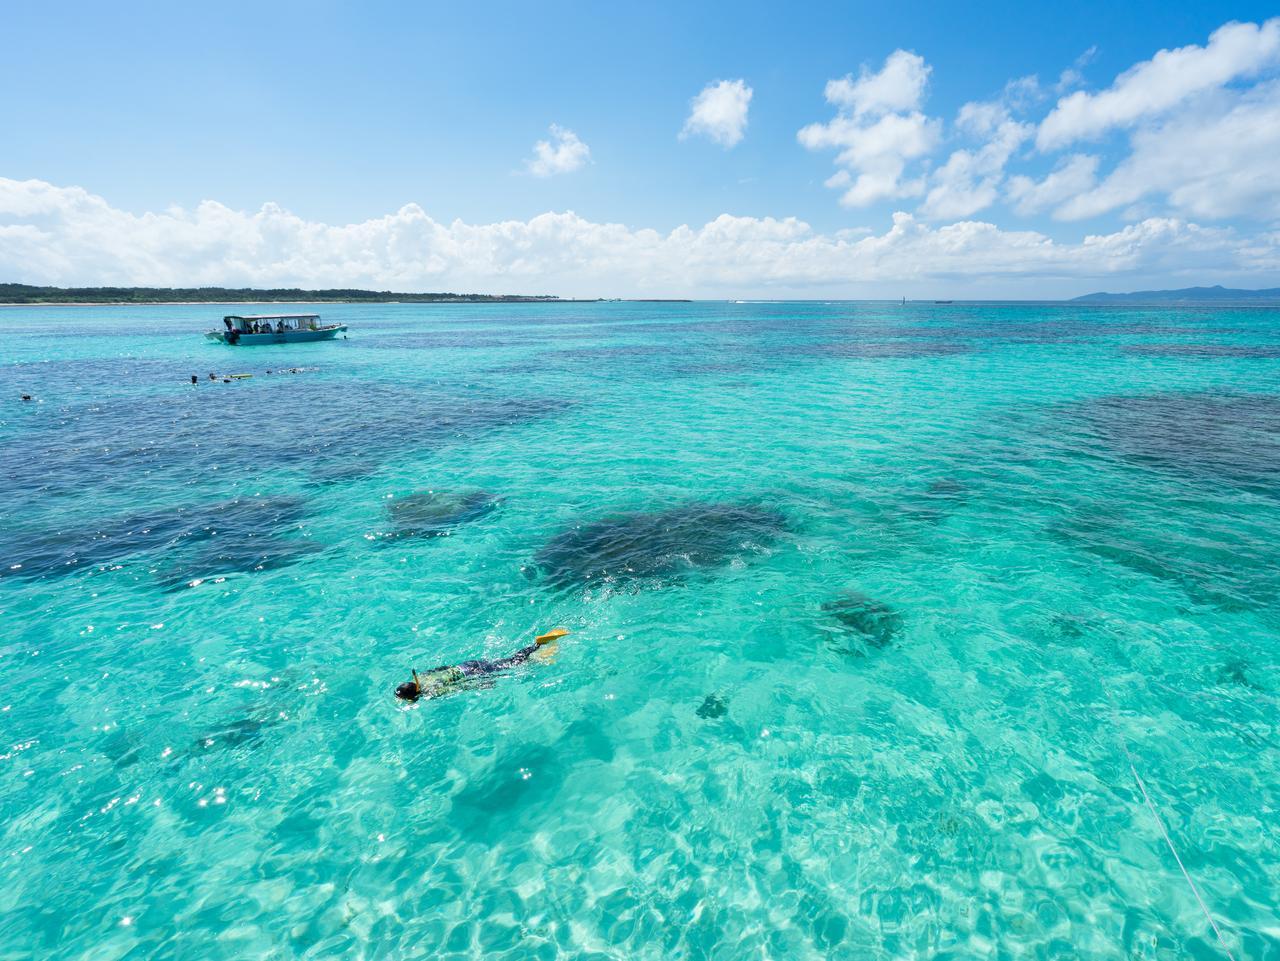 Idyllic beach in Okinawa, Japan